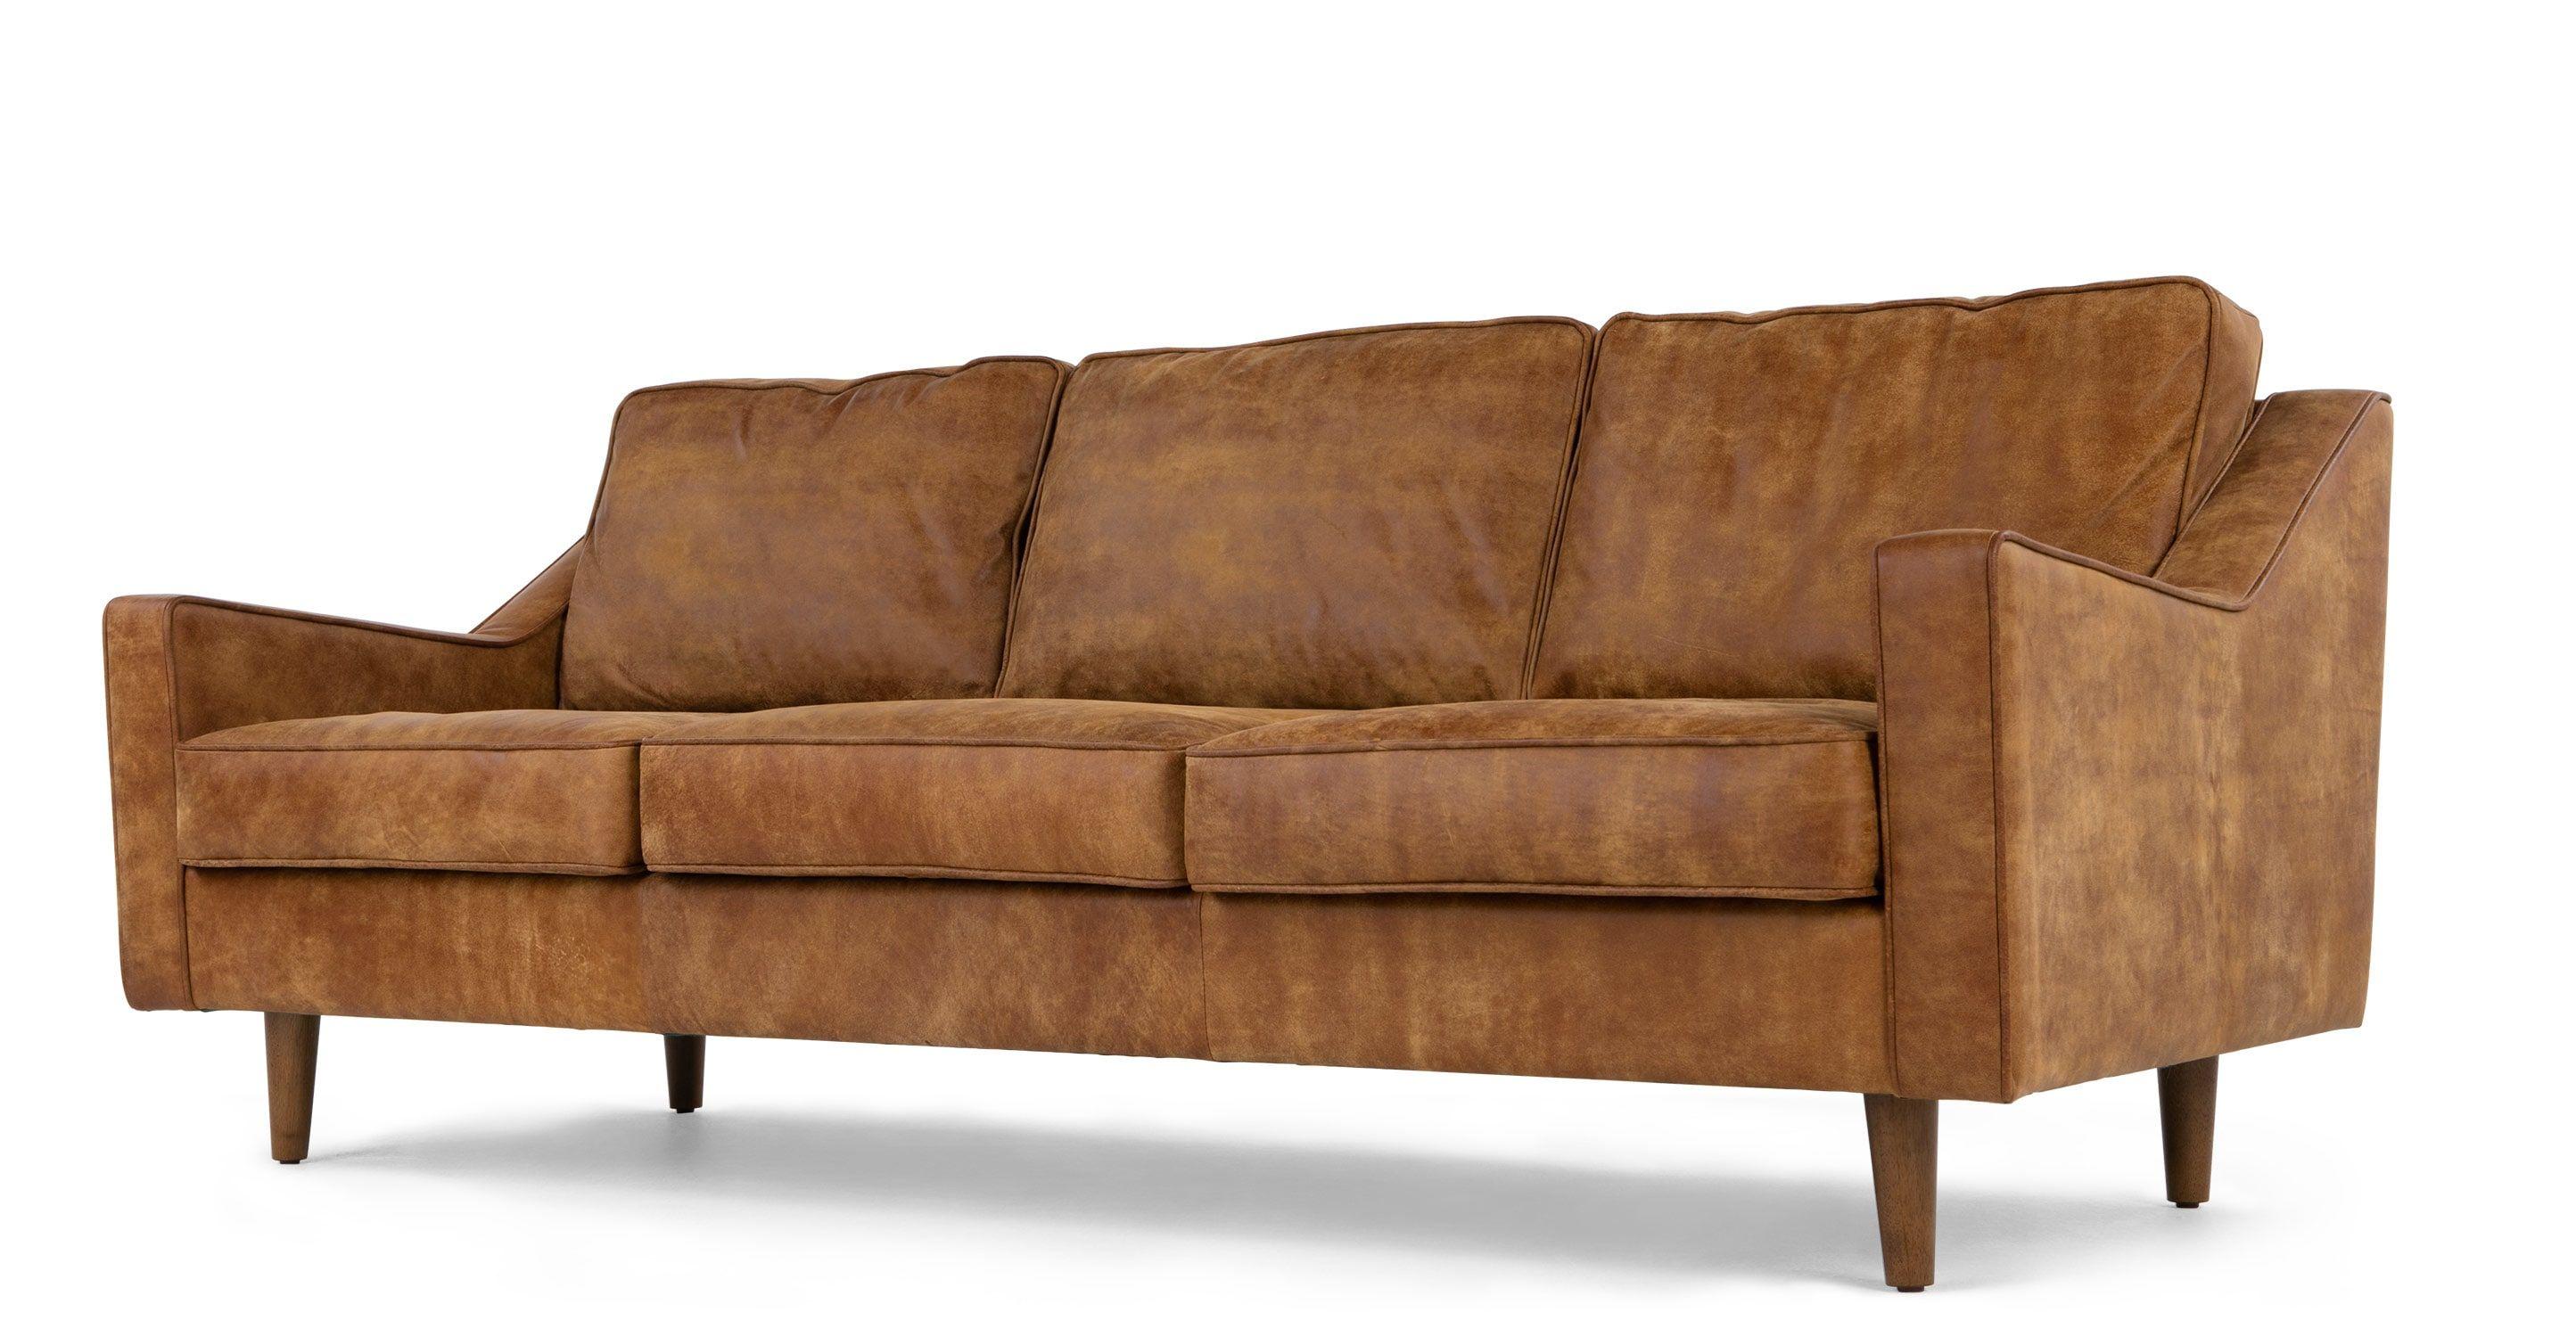 Dallas 3 Seater Sofa, Outback Tan Premium Leather | Living ...